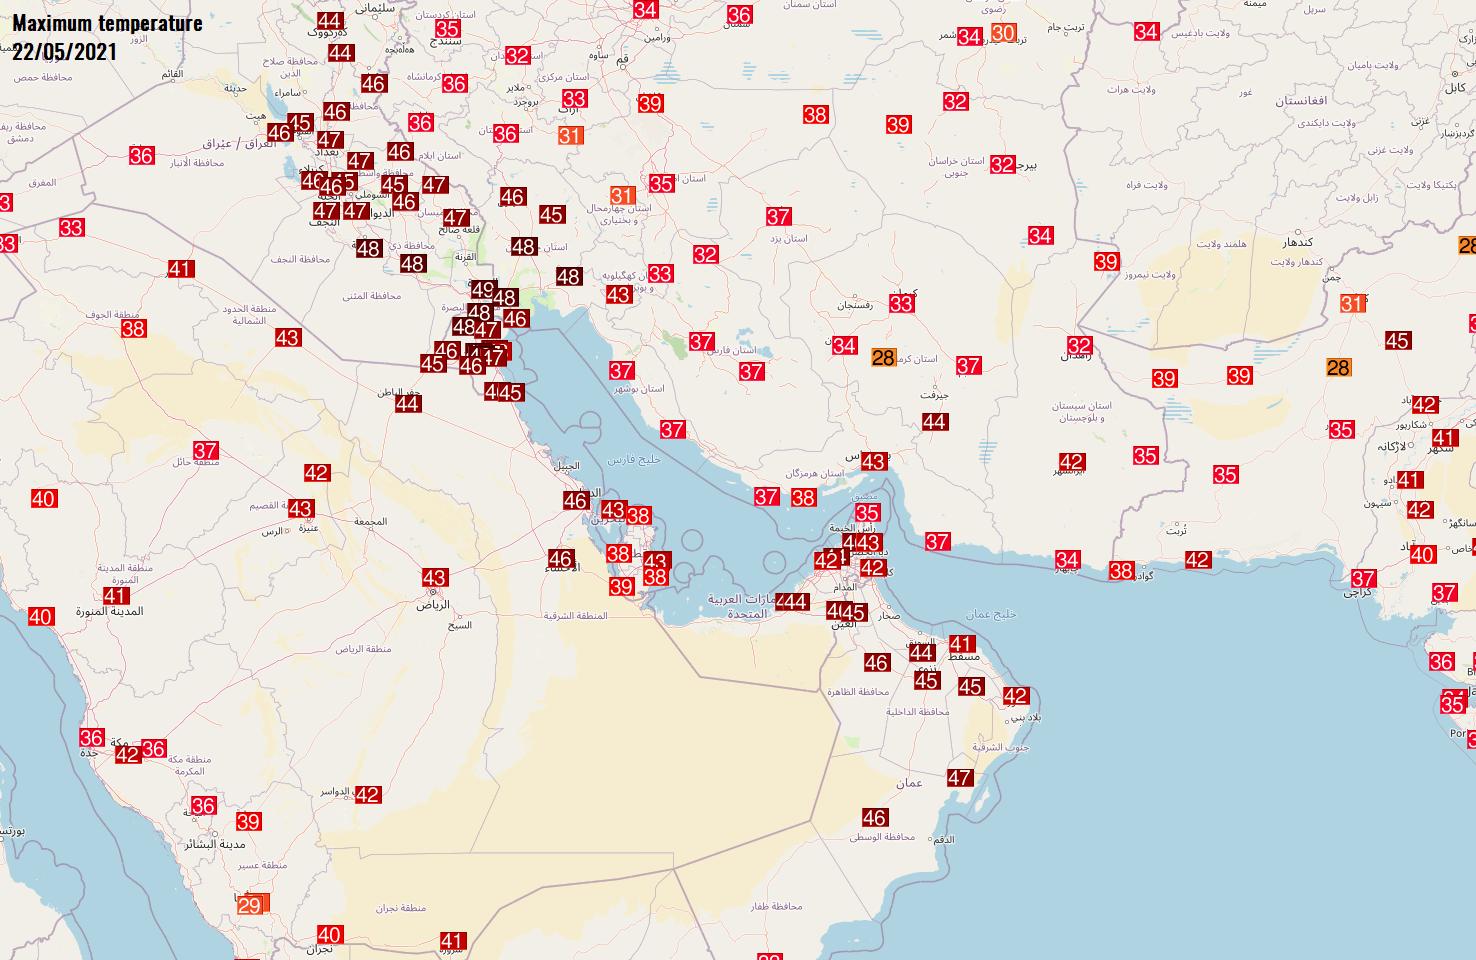 record-breaking-heatwave-russia-middle-east-arabian-peninsula-saturday-maximum